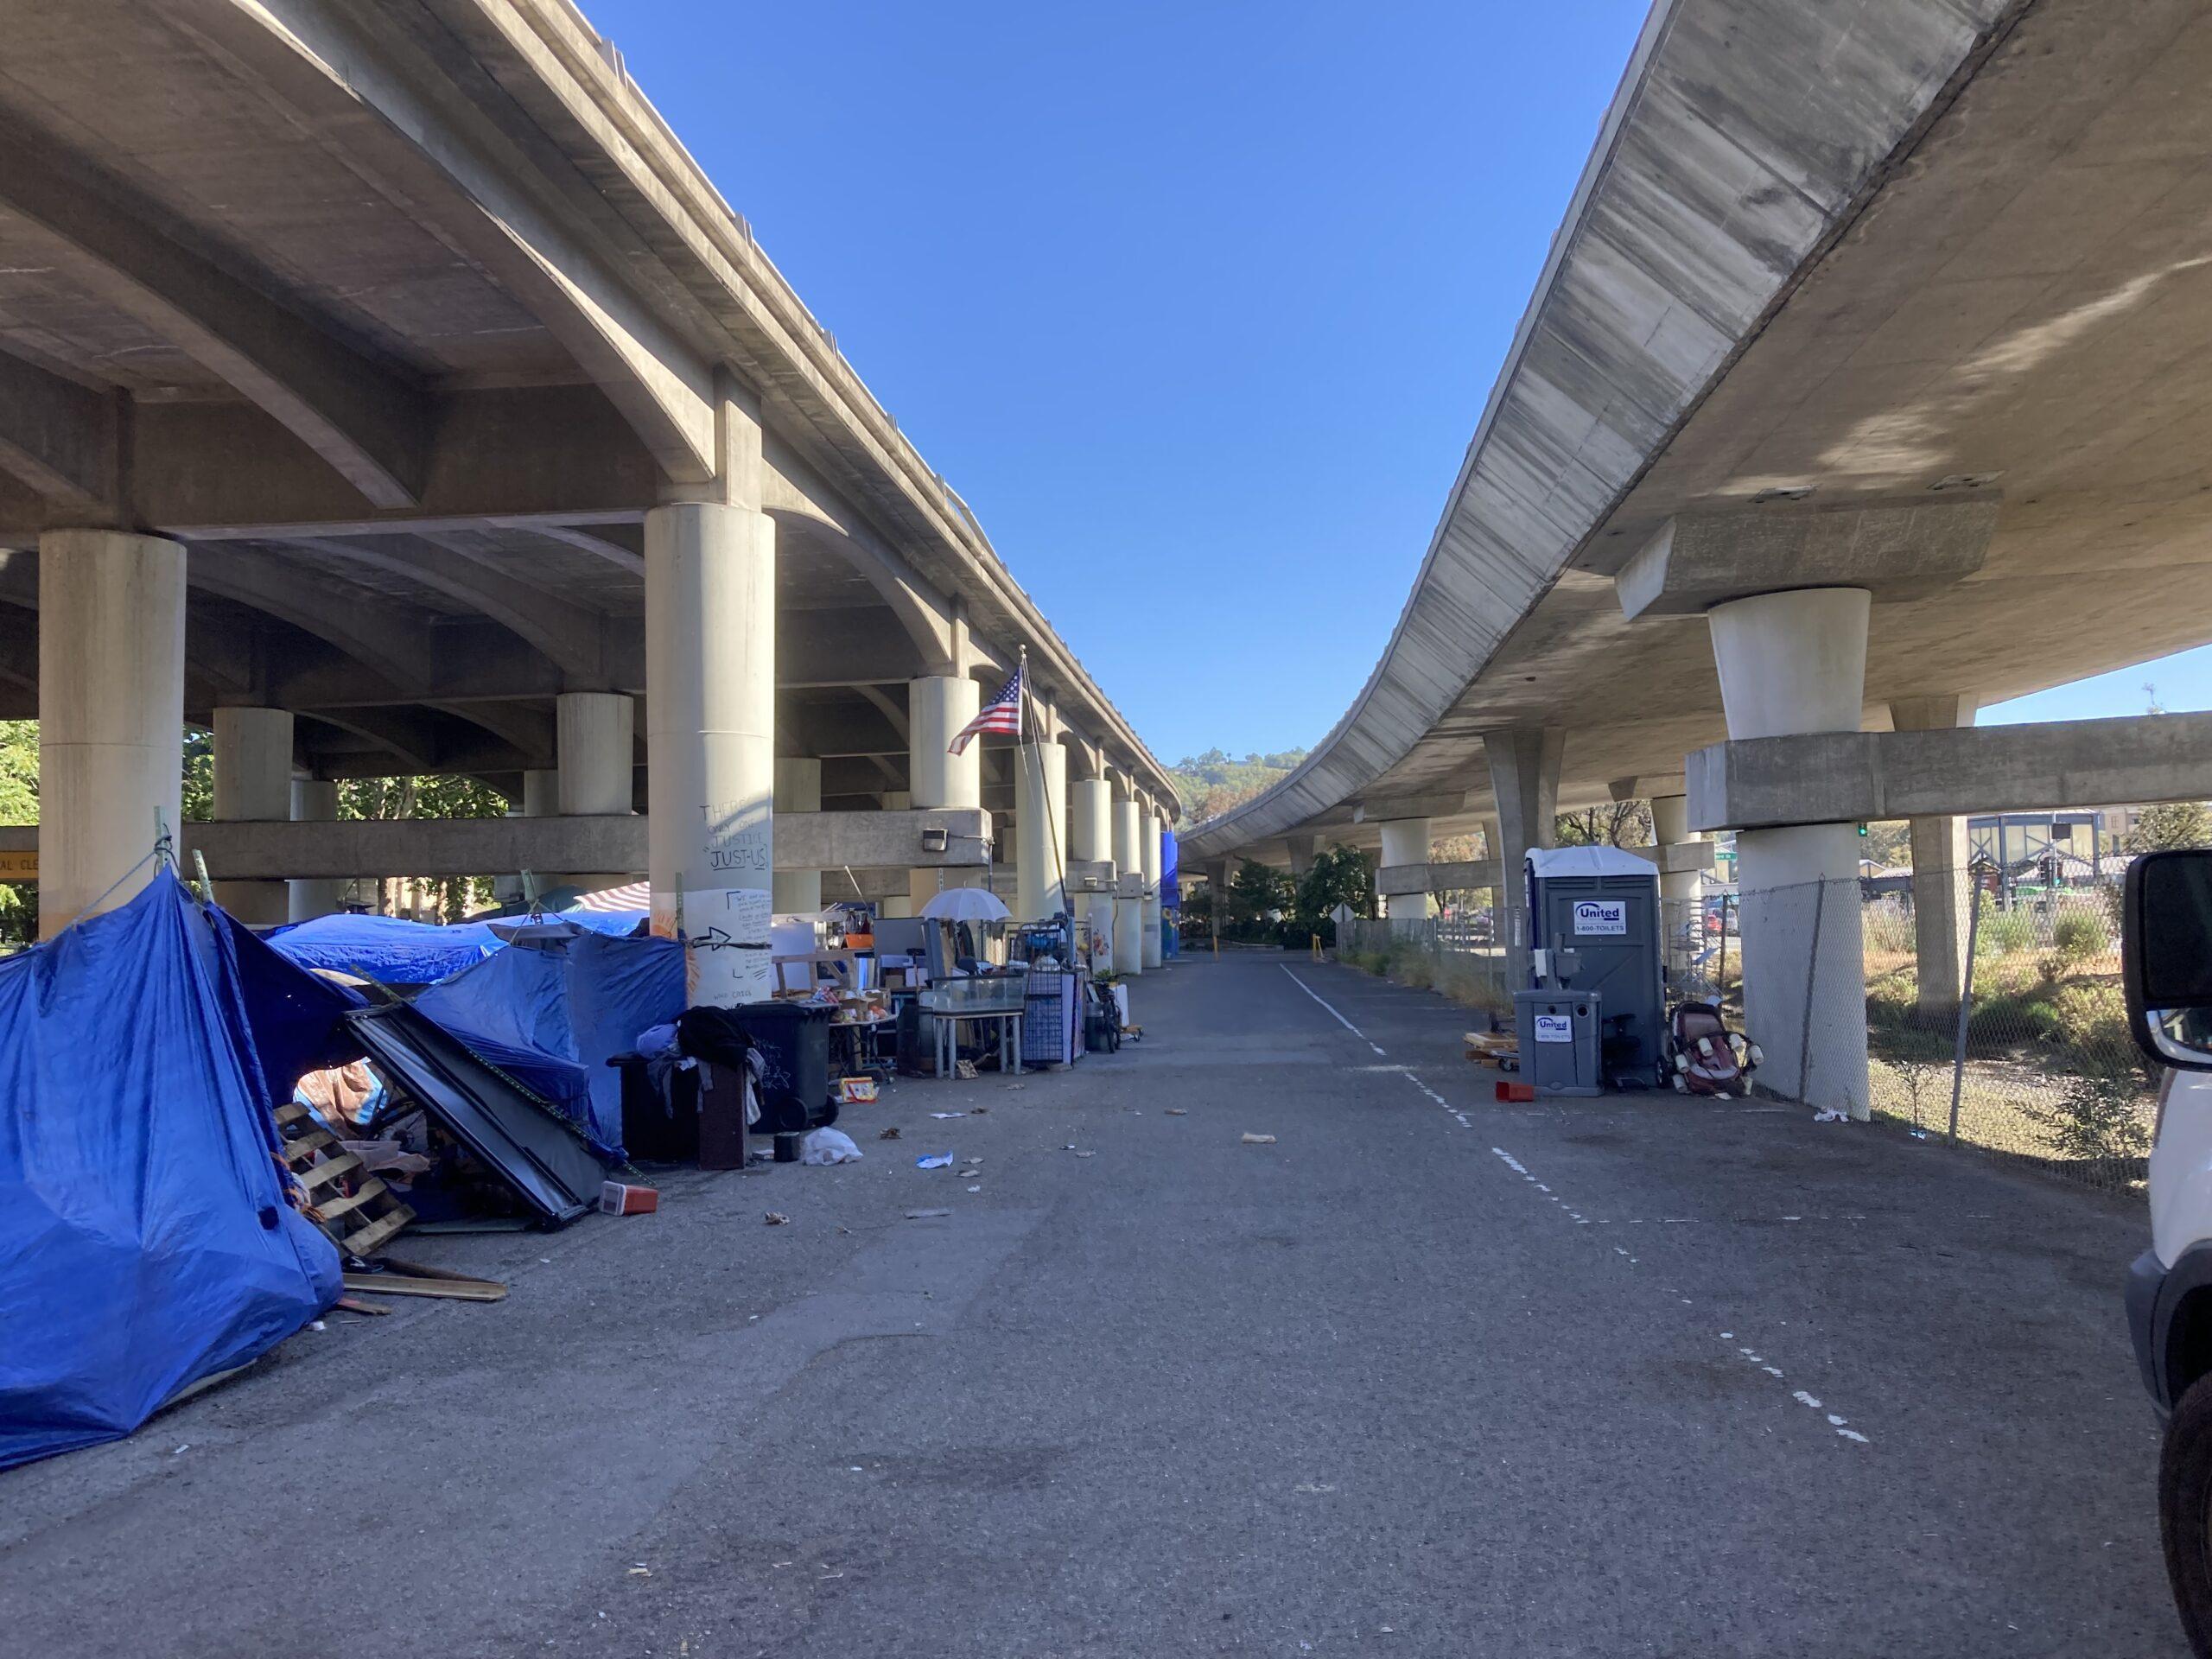 San Rafael homeless encampment